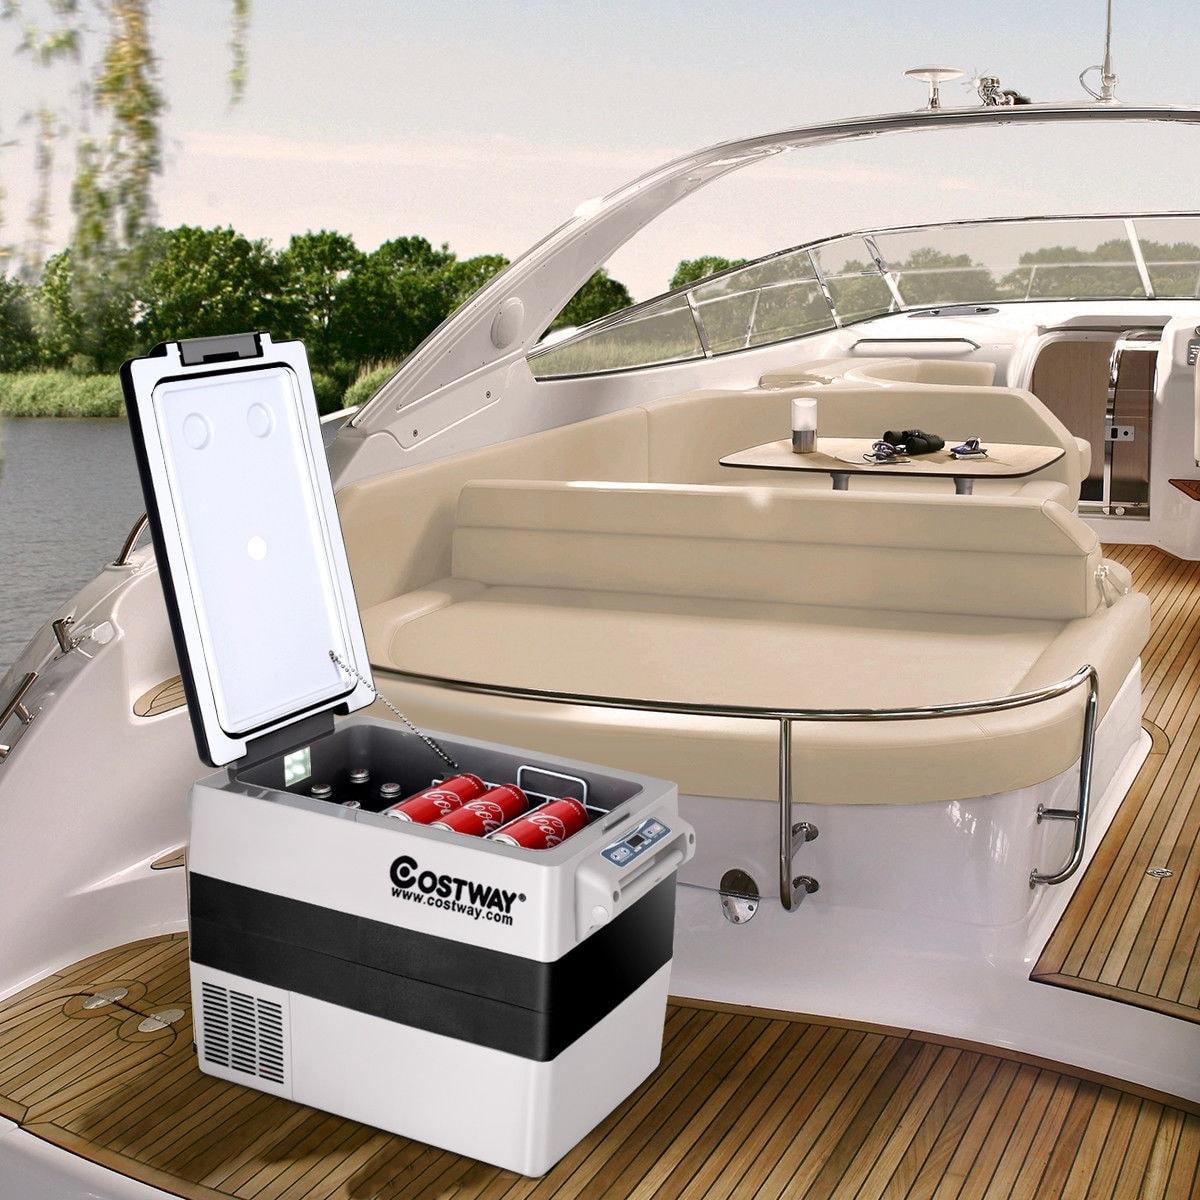 Costway 54 Quarts Portable Electric Car Cooler Refrigerator/Freezer  Compressor Camping - White + Gray